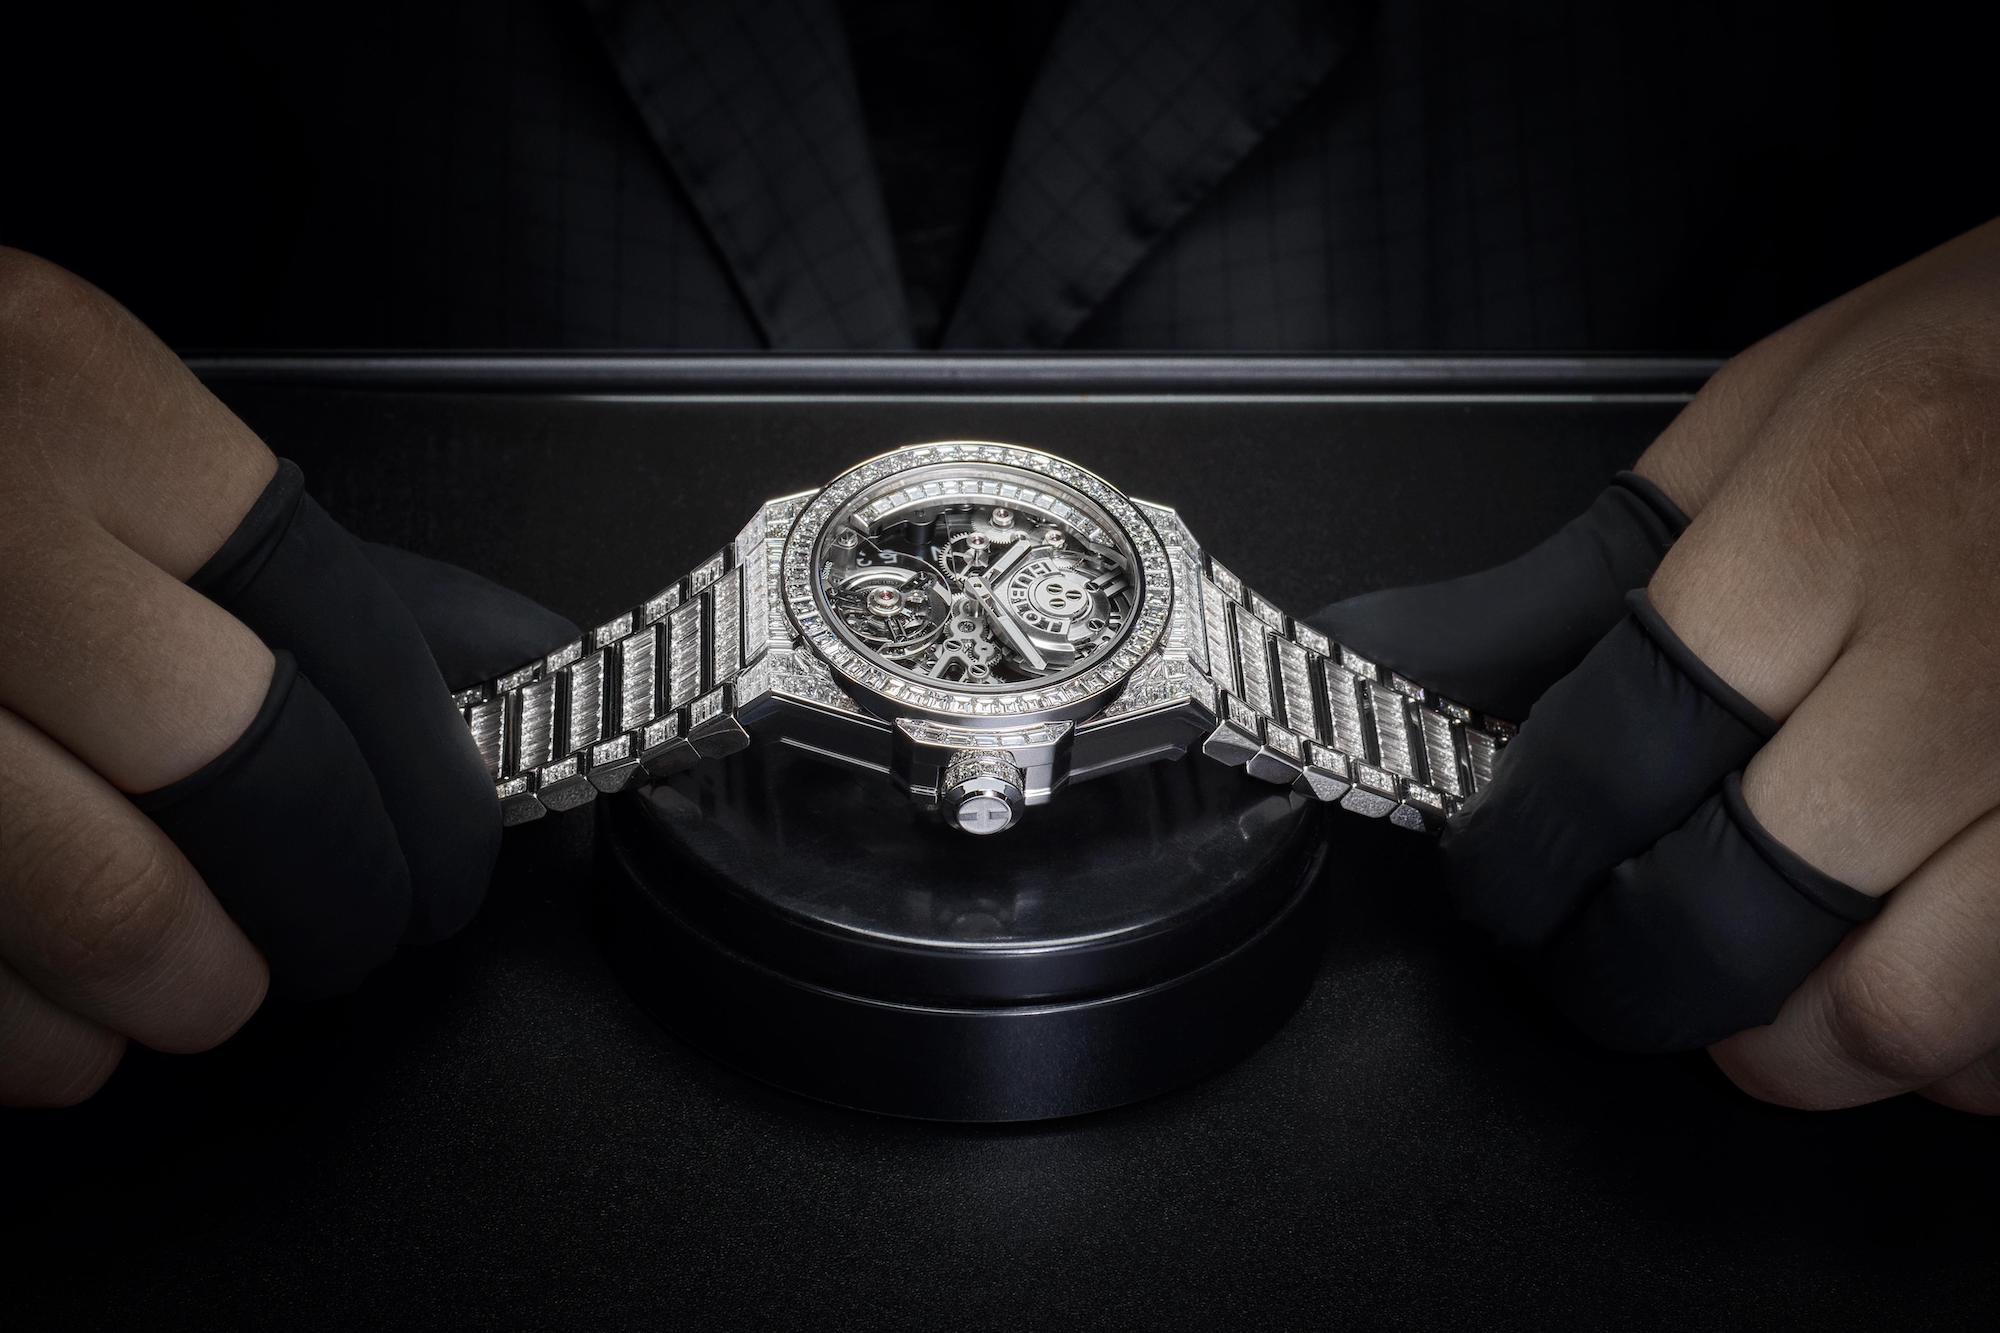 Hublot Big Bang Integral Tourbillon High Jewellery 455.WX.9000.WX.9904 Watch making